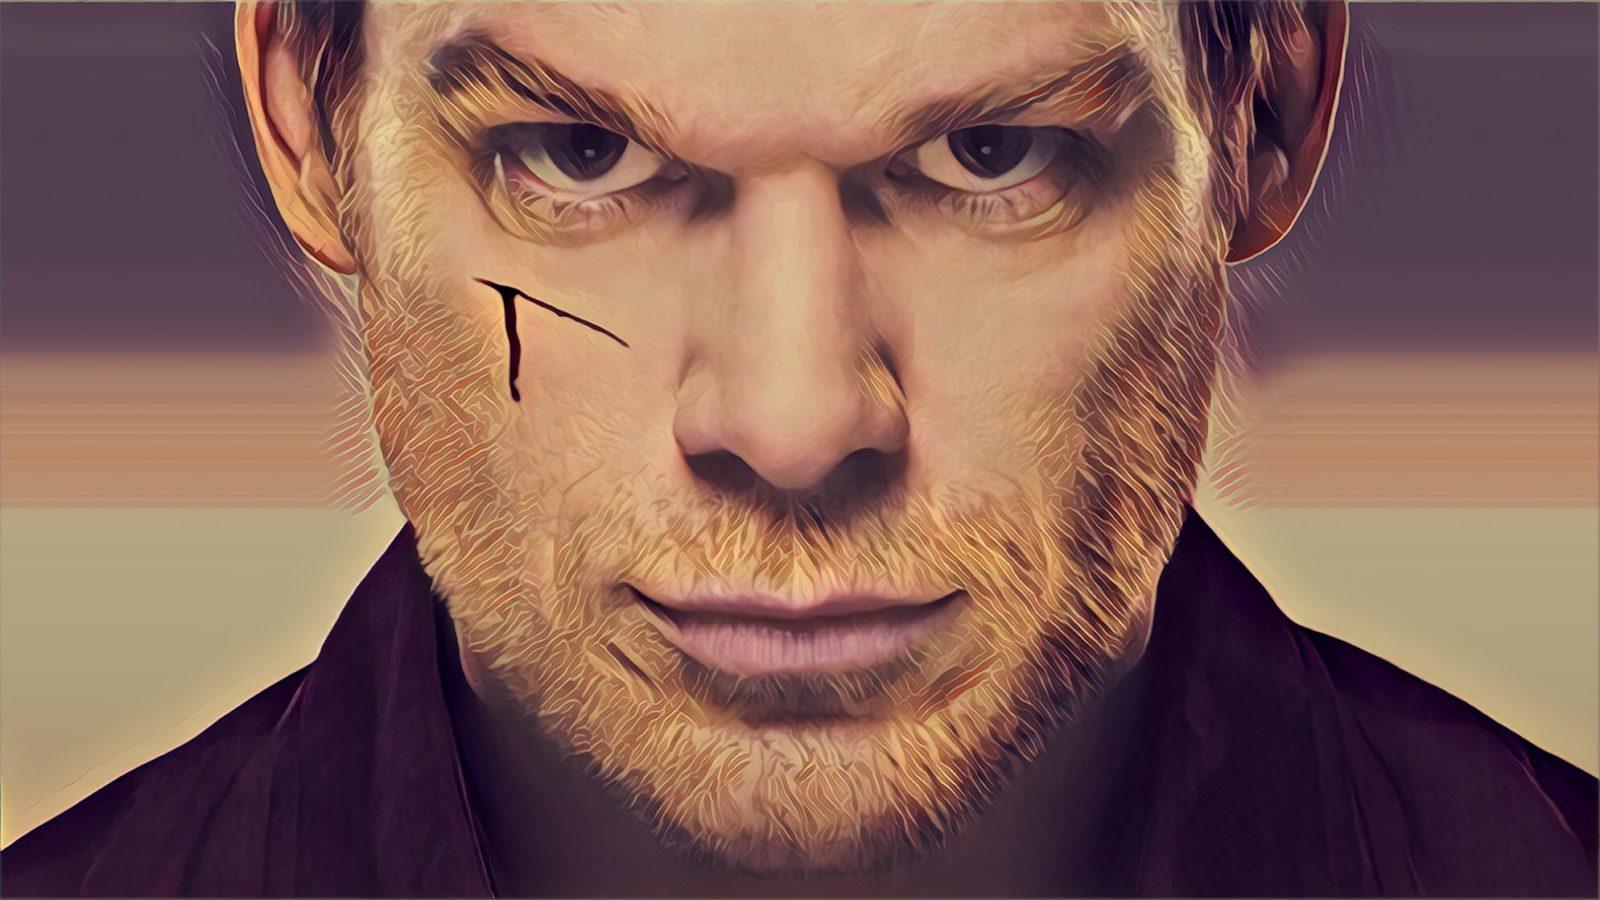 Musica da psicopatici: esiste una playlist per individuarli?